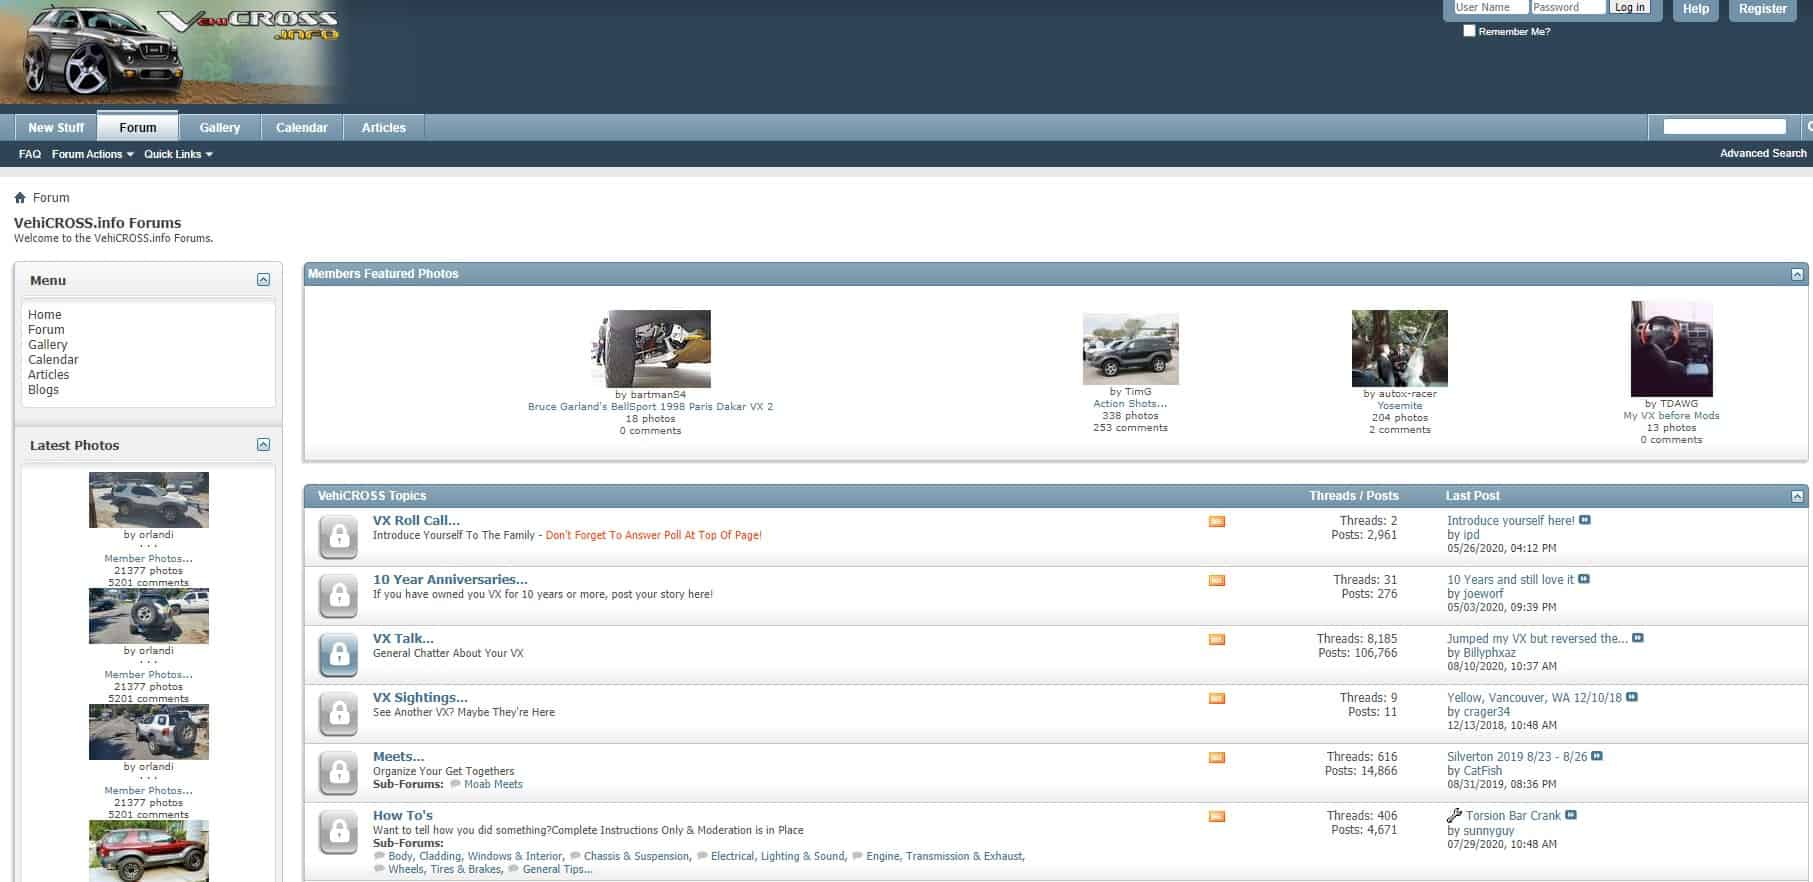 vehicross.info forum